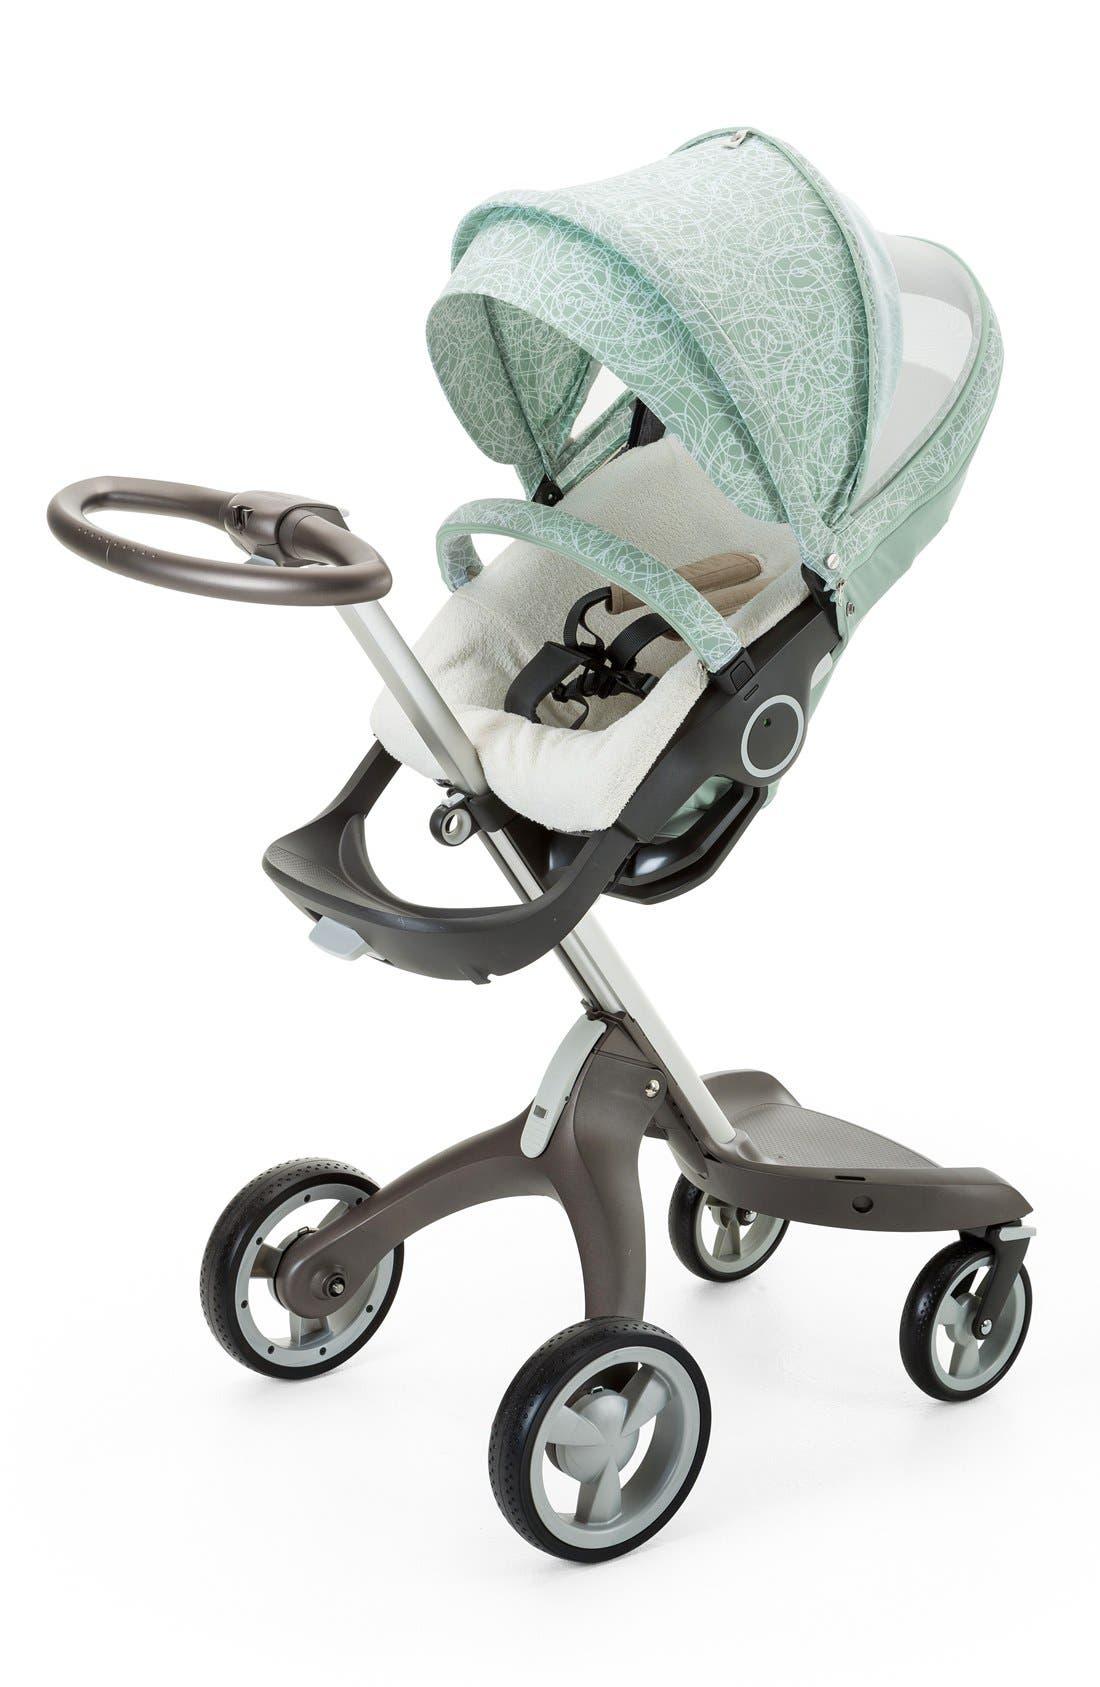 Baby 'Xplory<sup>®</sup> Stroller Summer Kit' Shade Set,                             Alternate thumbnail 3, color,                             Salty Blue